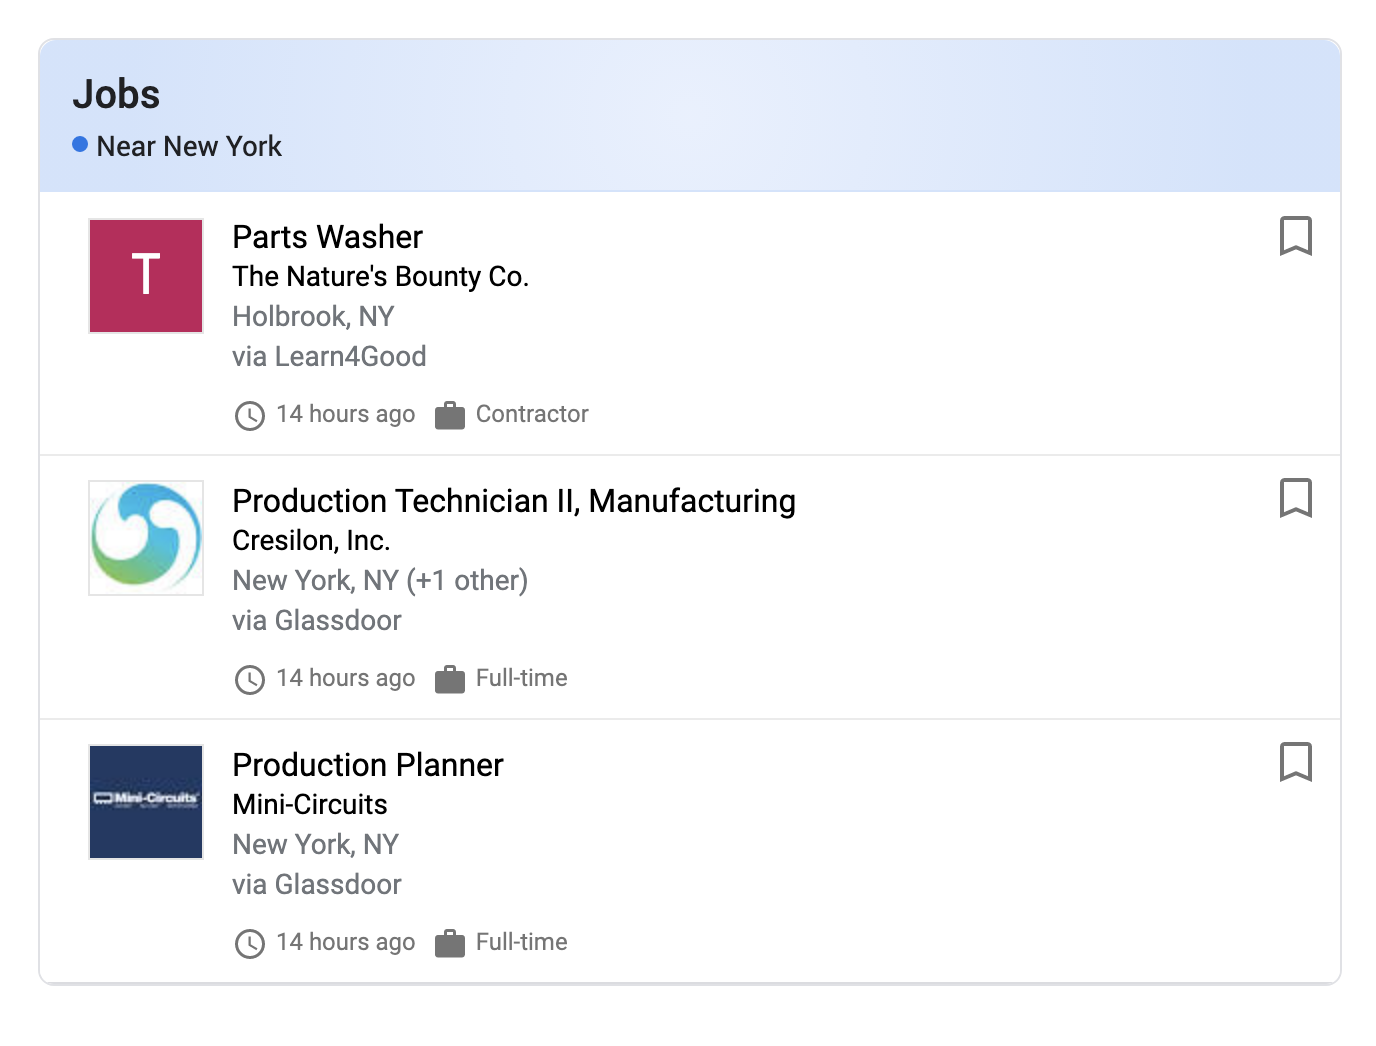 017-Google-Jobs-Search